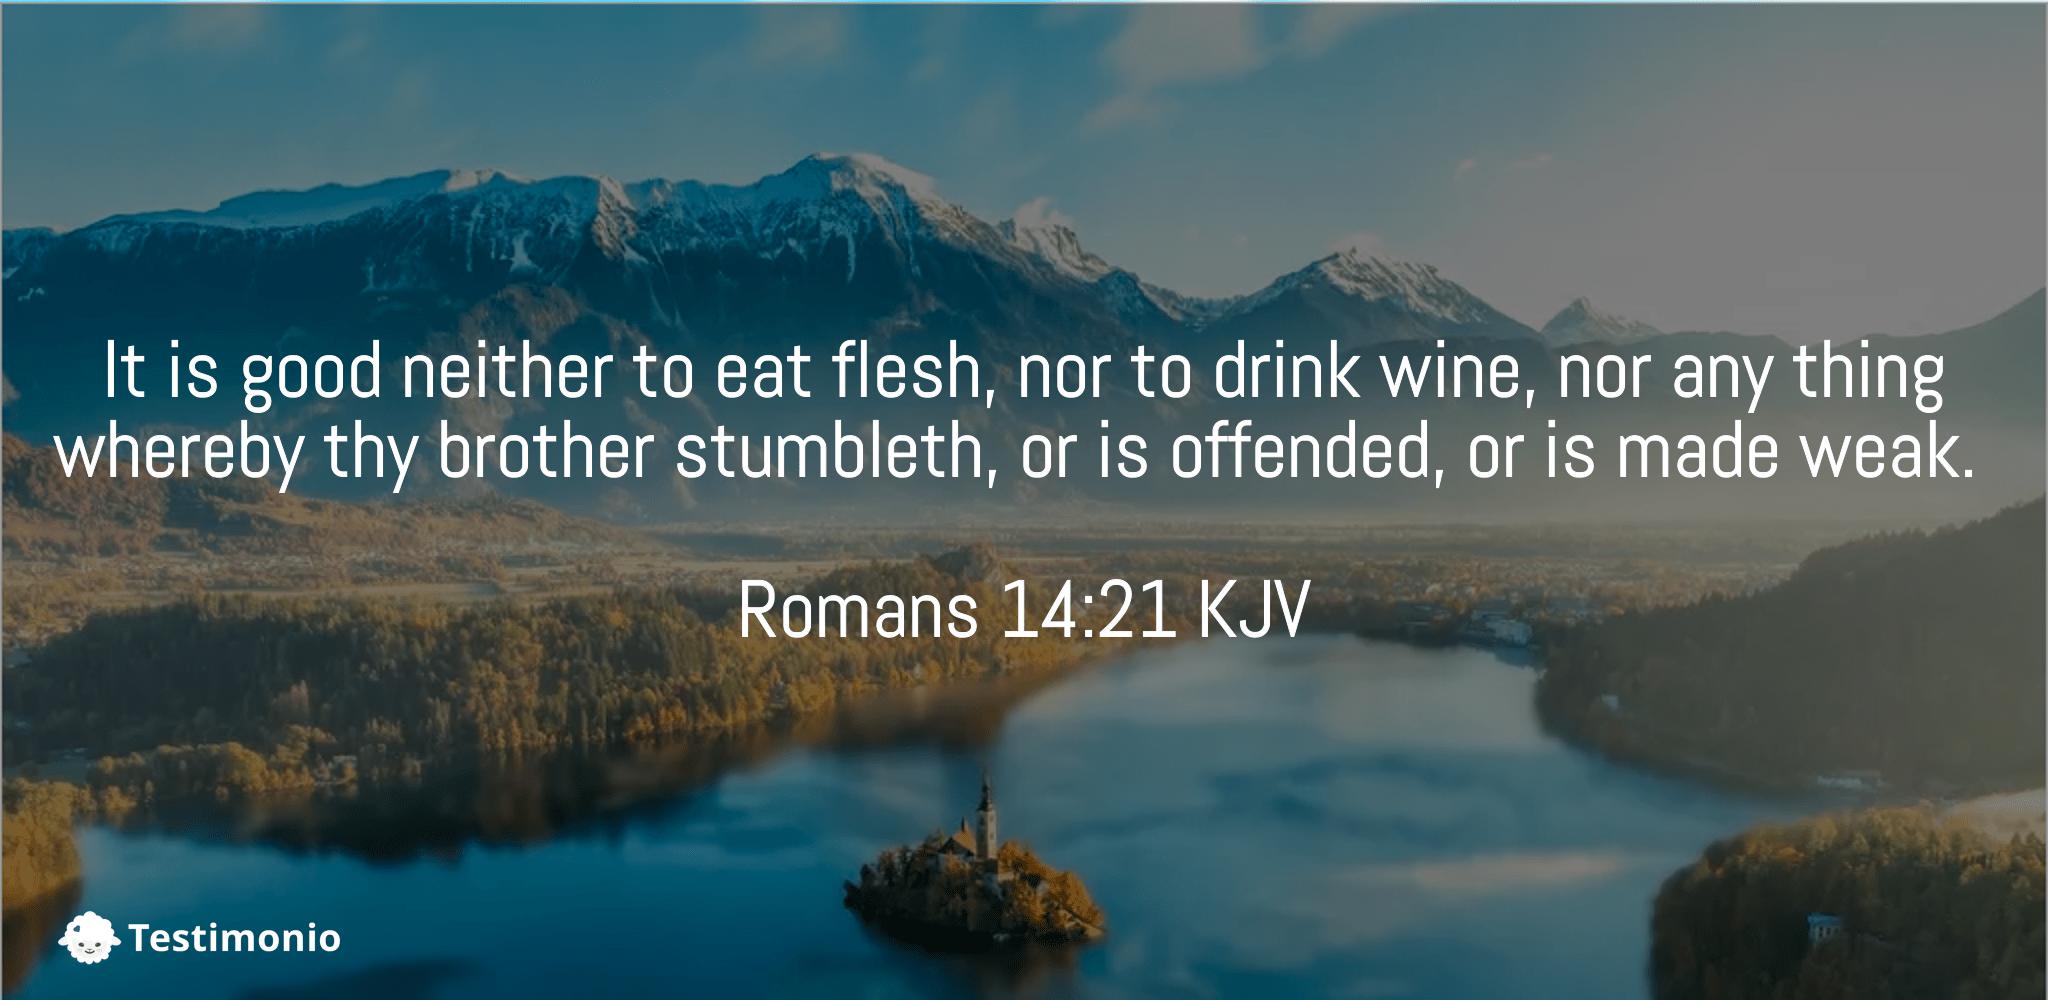 Romans 14:21